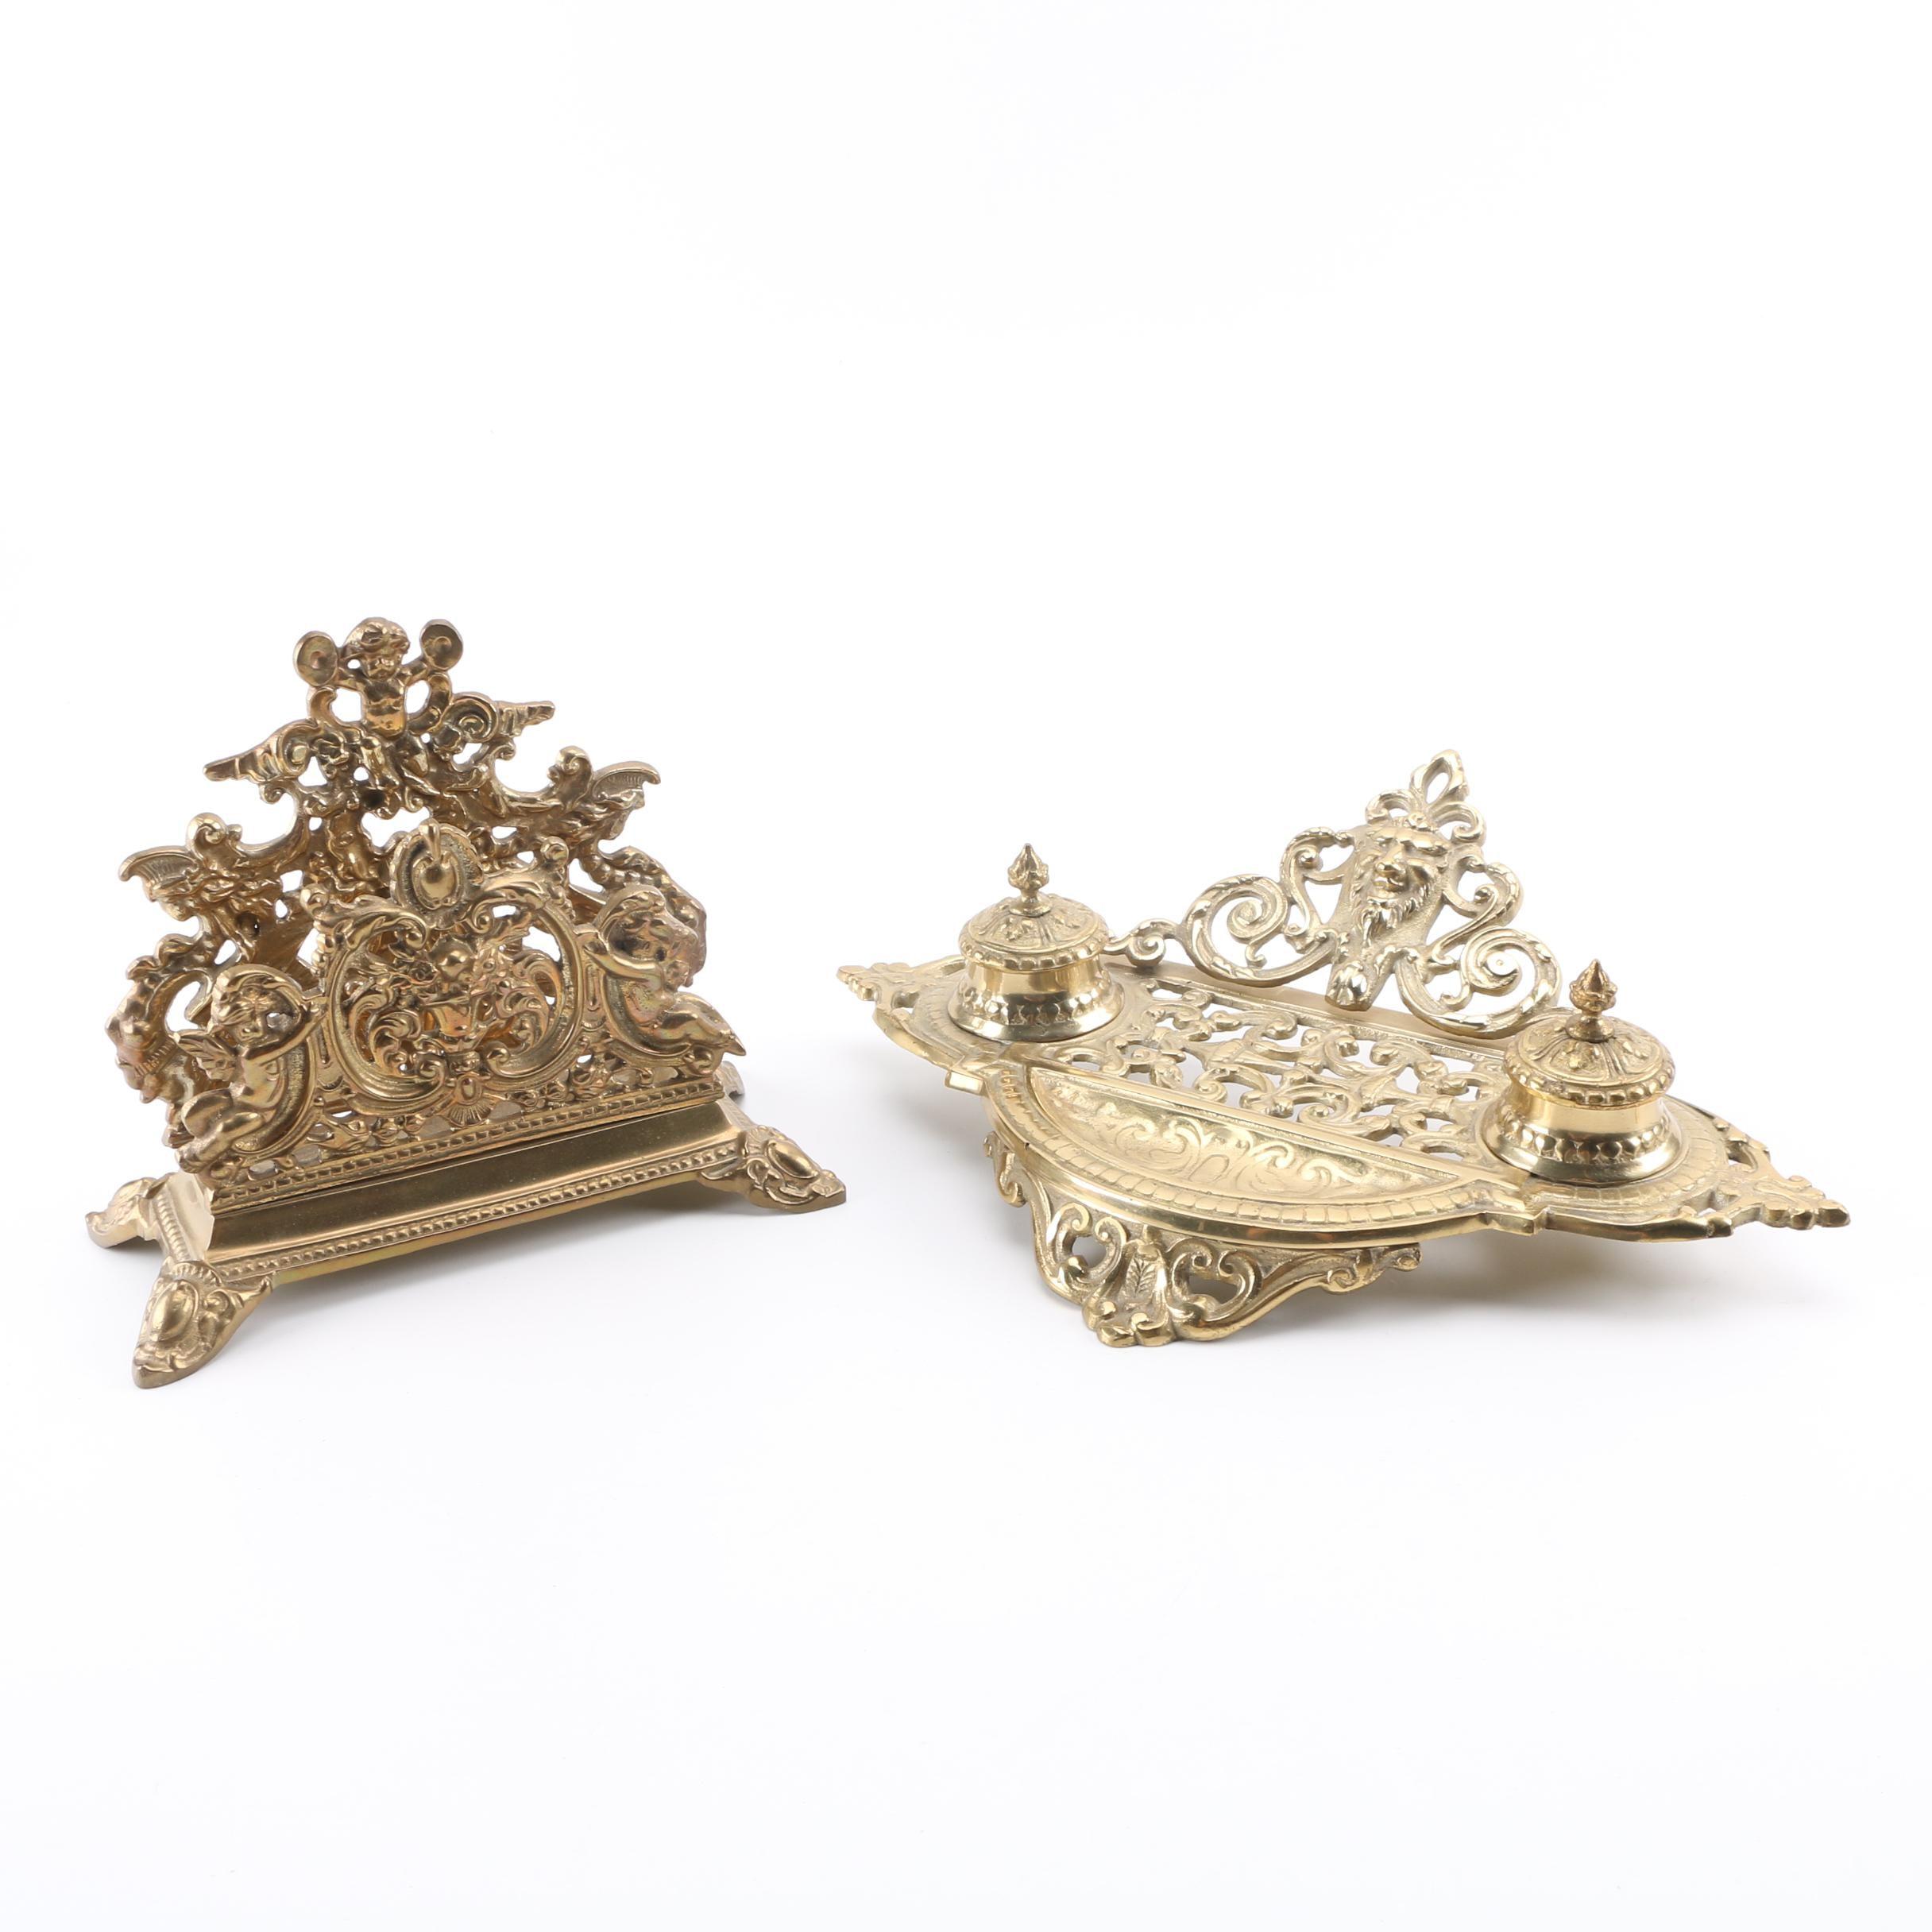 Brass Letter Holder and Inkwell Desk Set